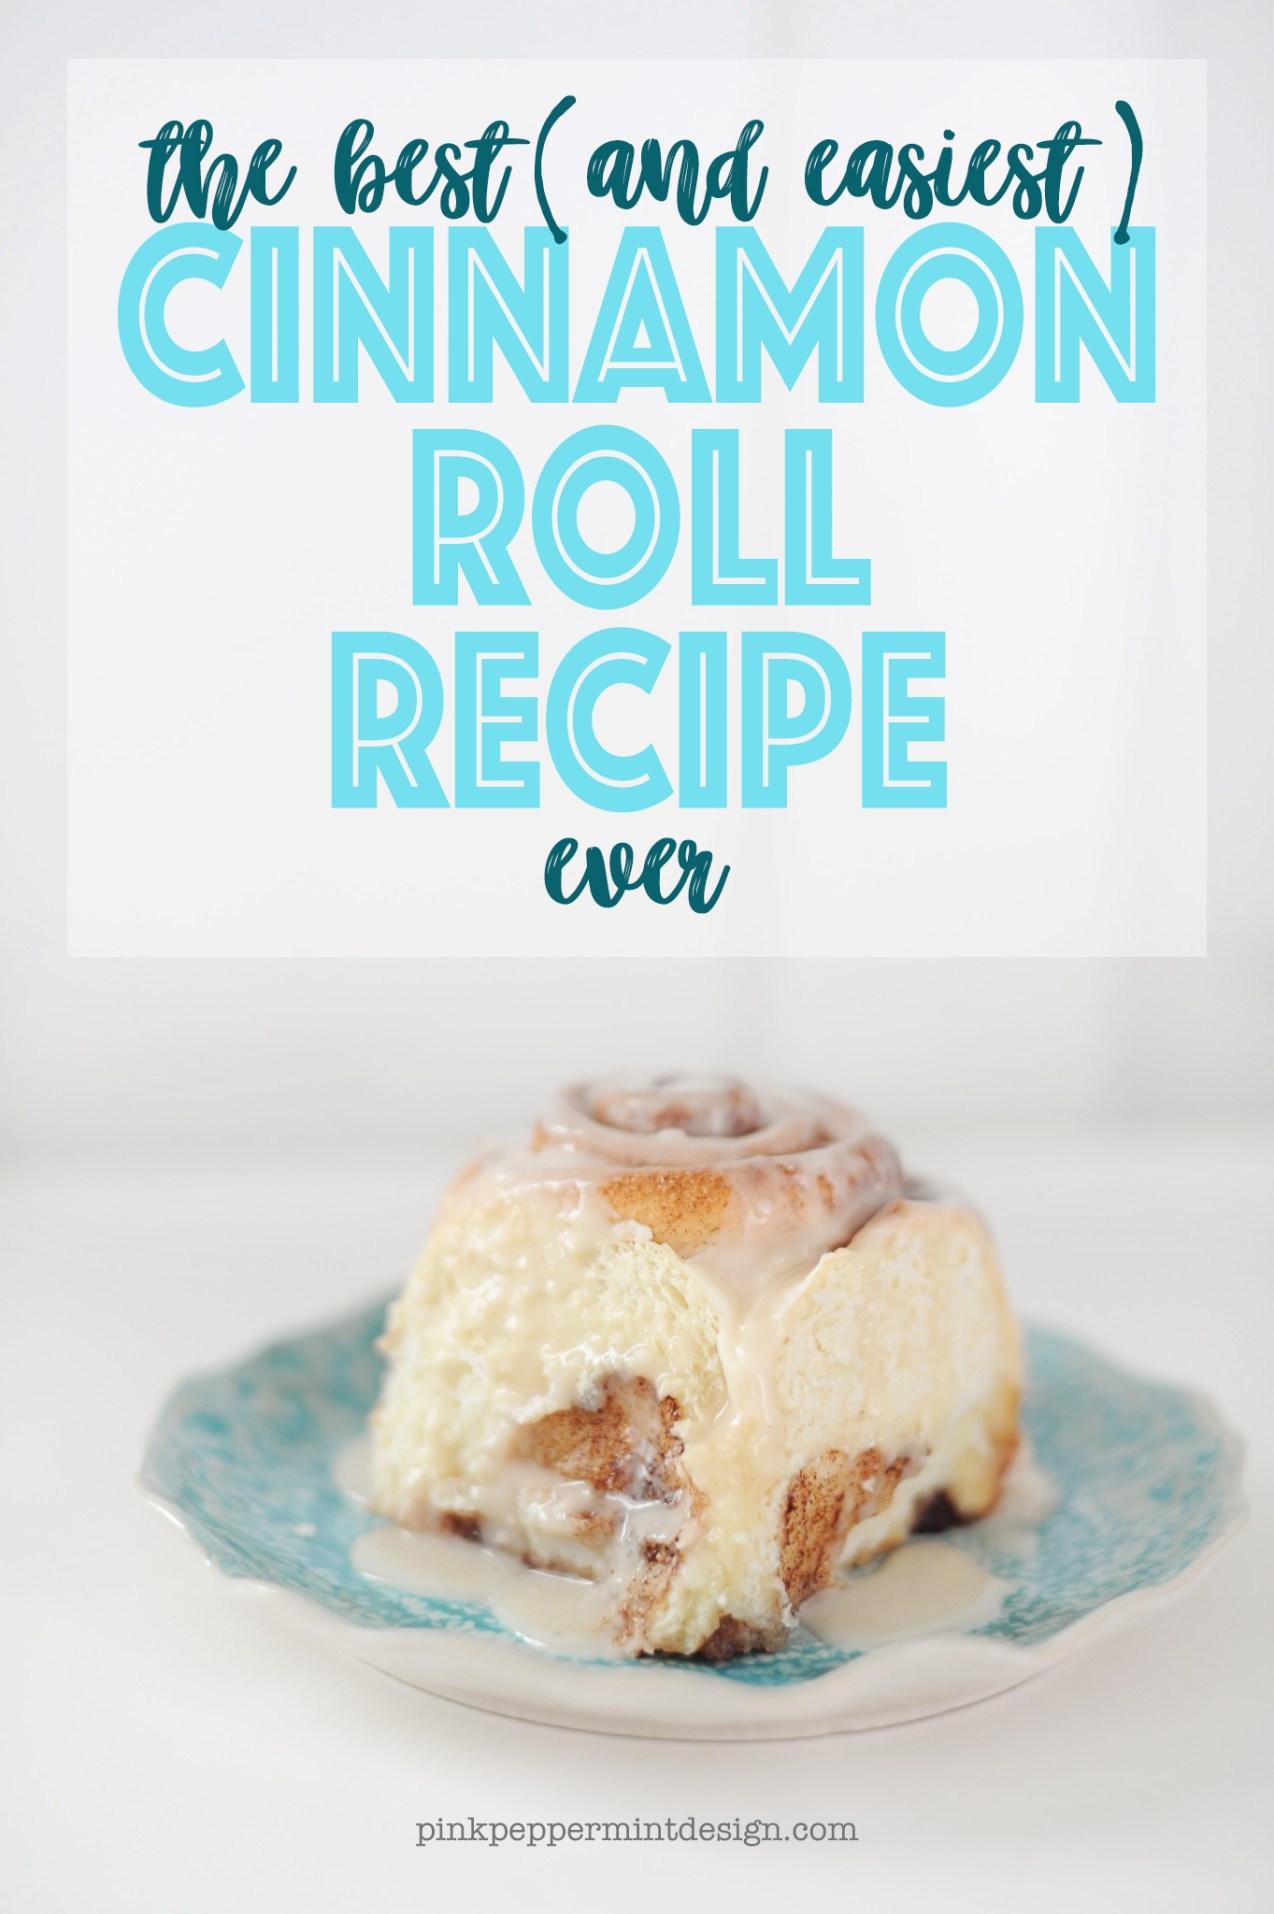 The best cinnamon roll recipe 1